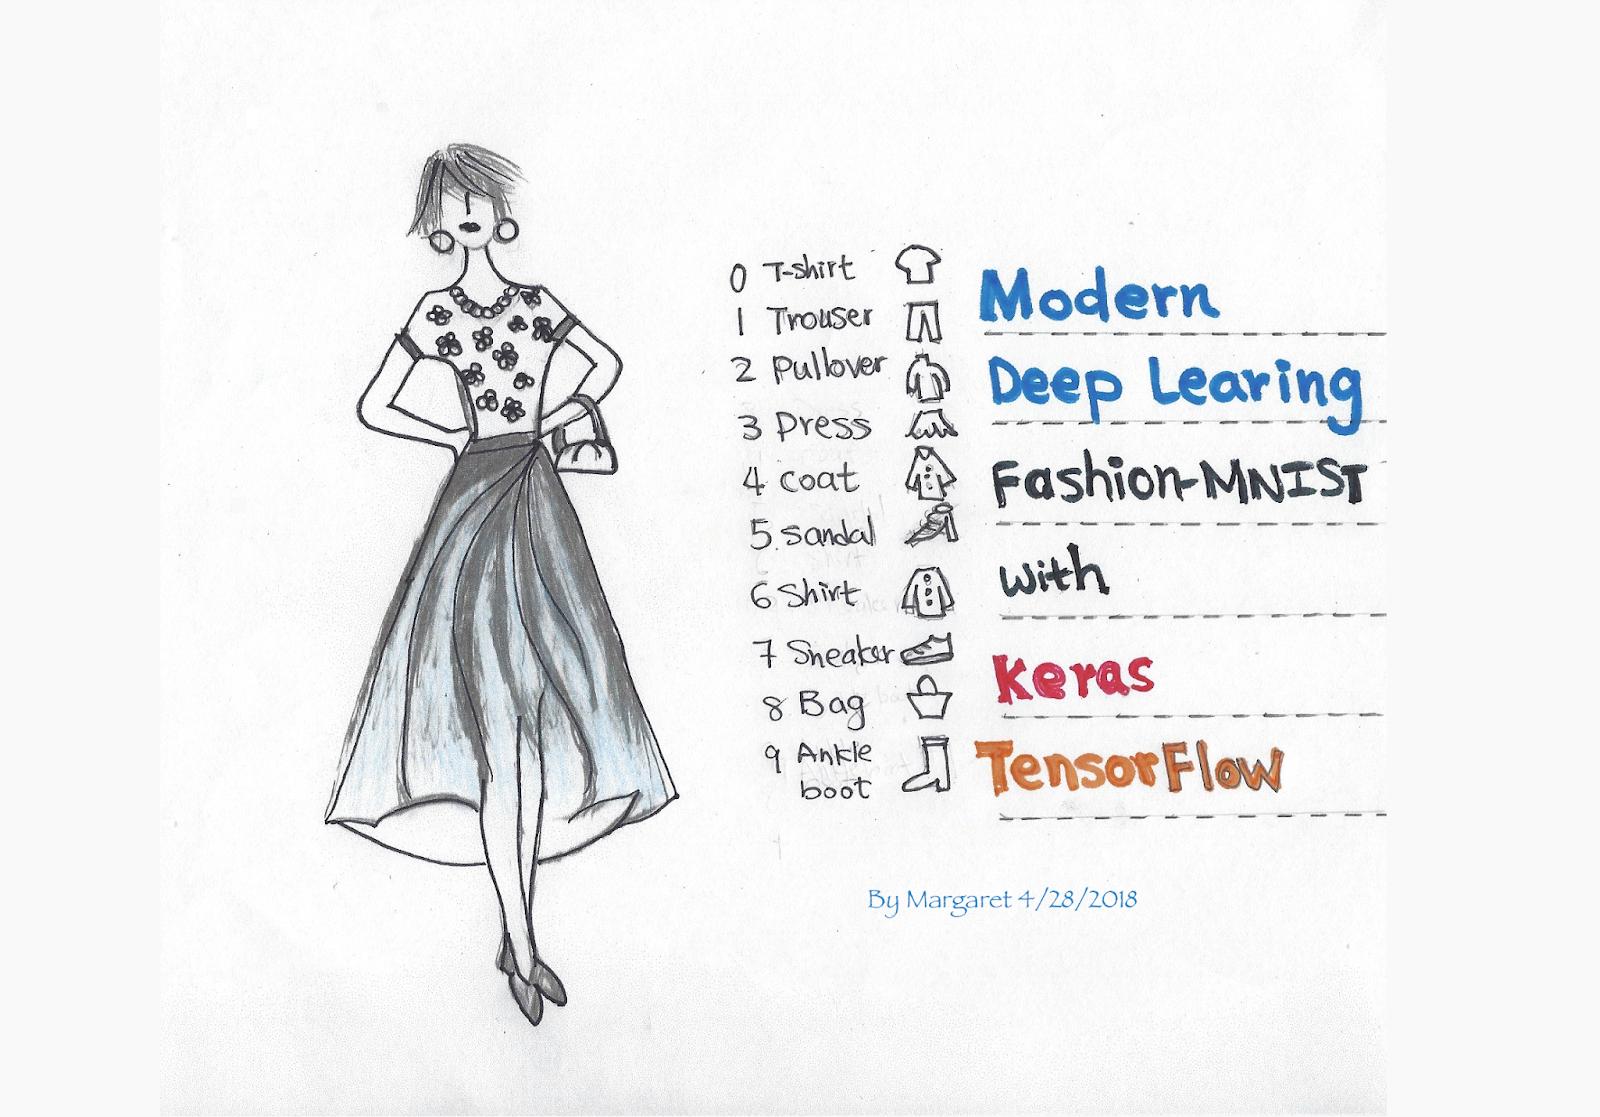 Fashion-MNIST with tf.Keras